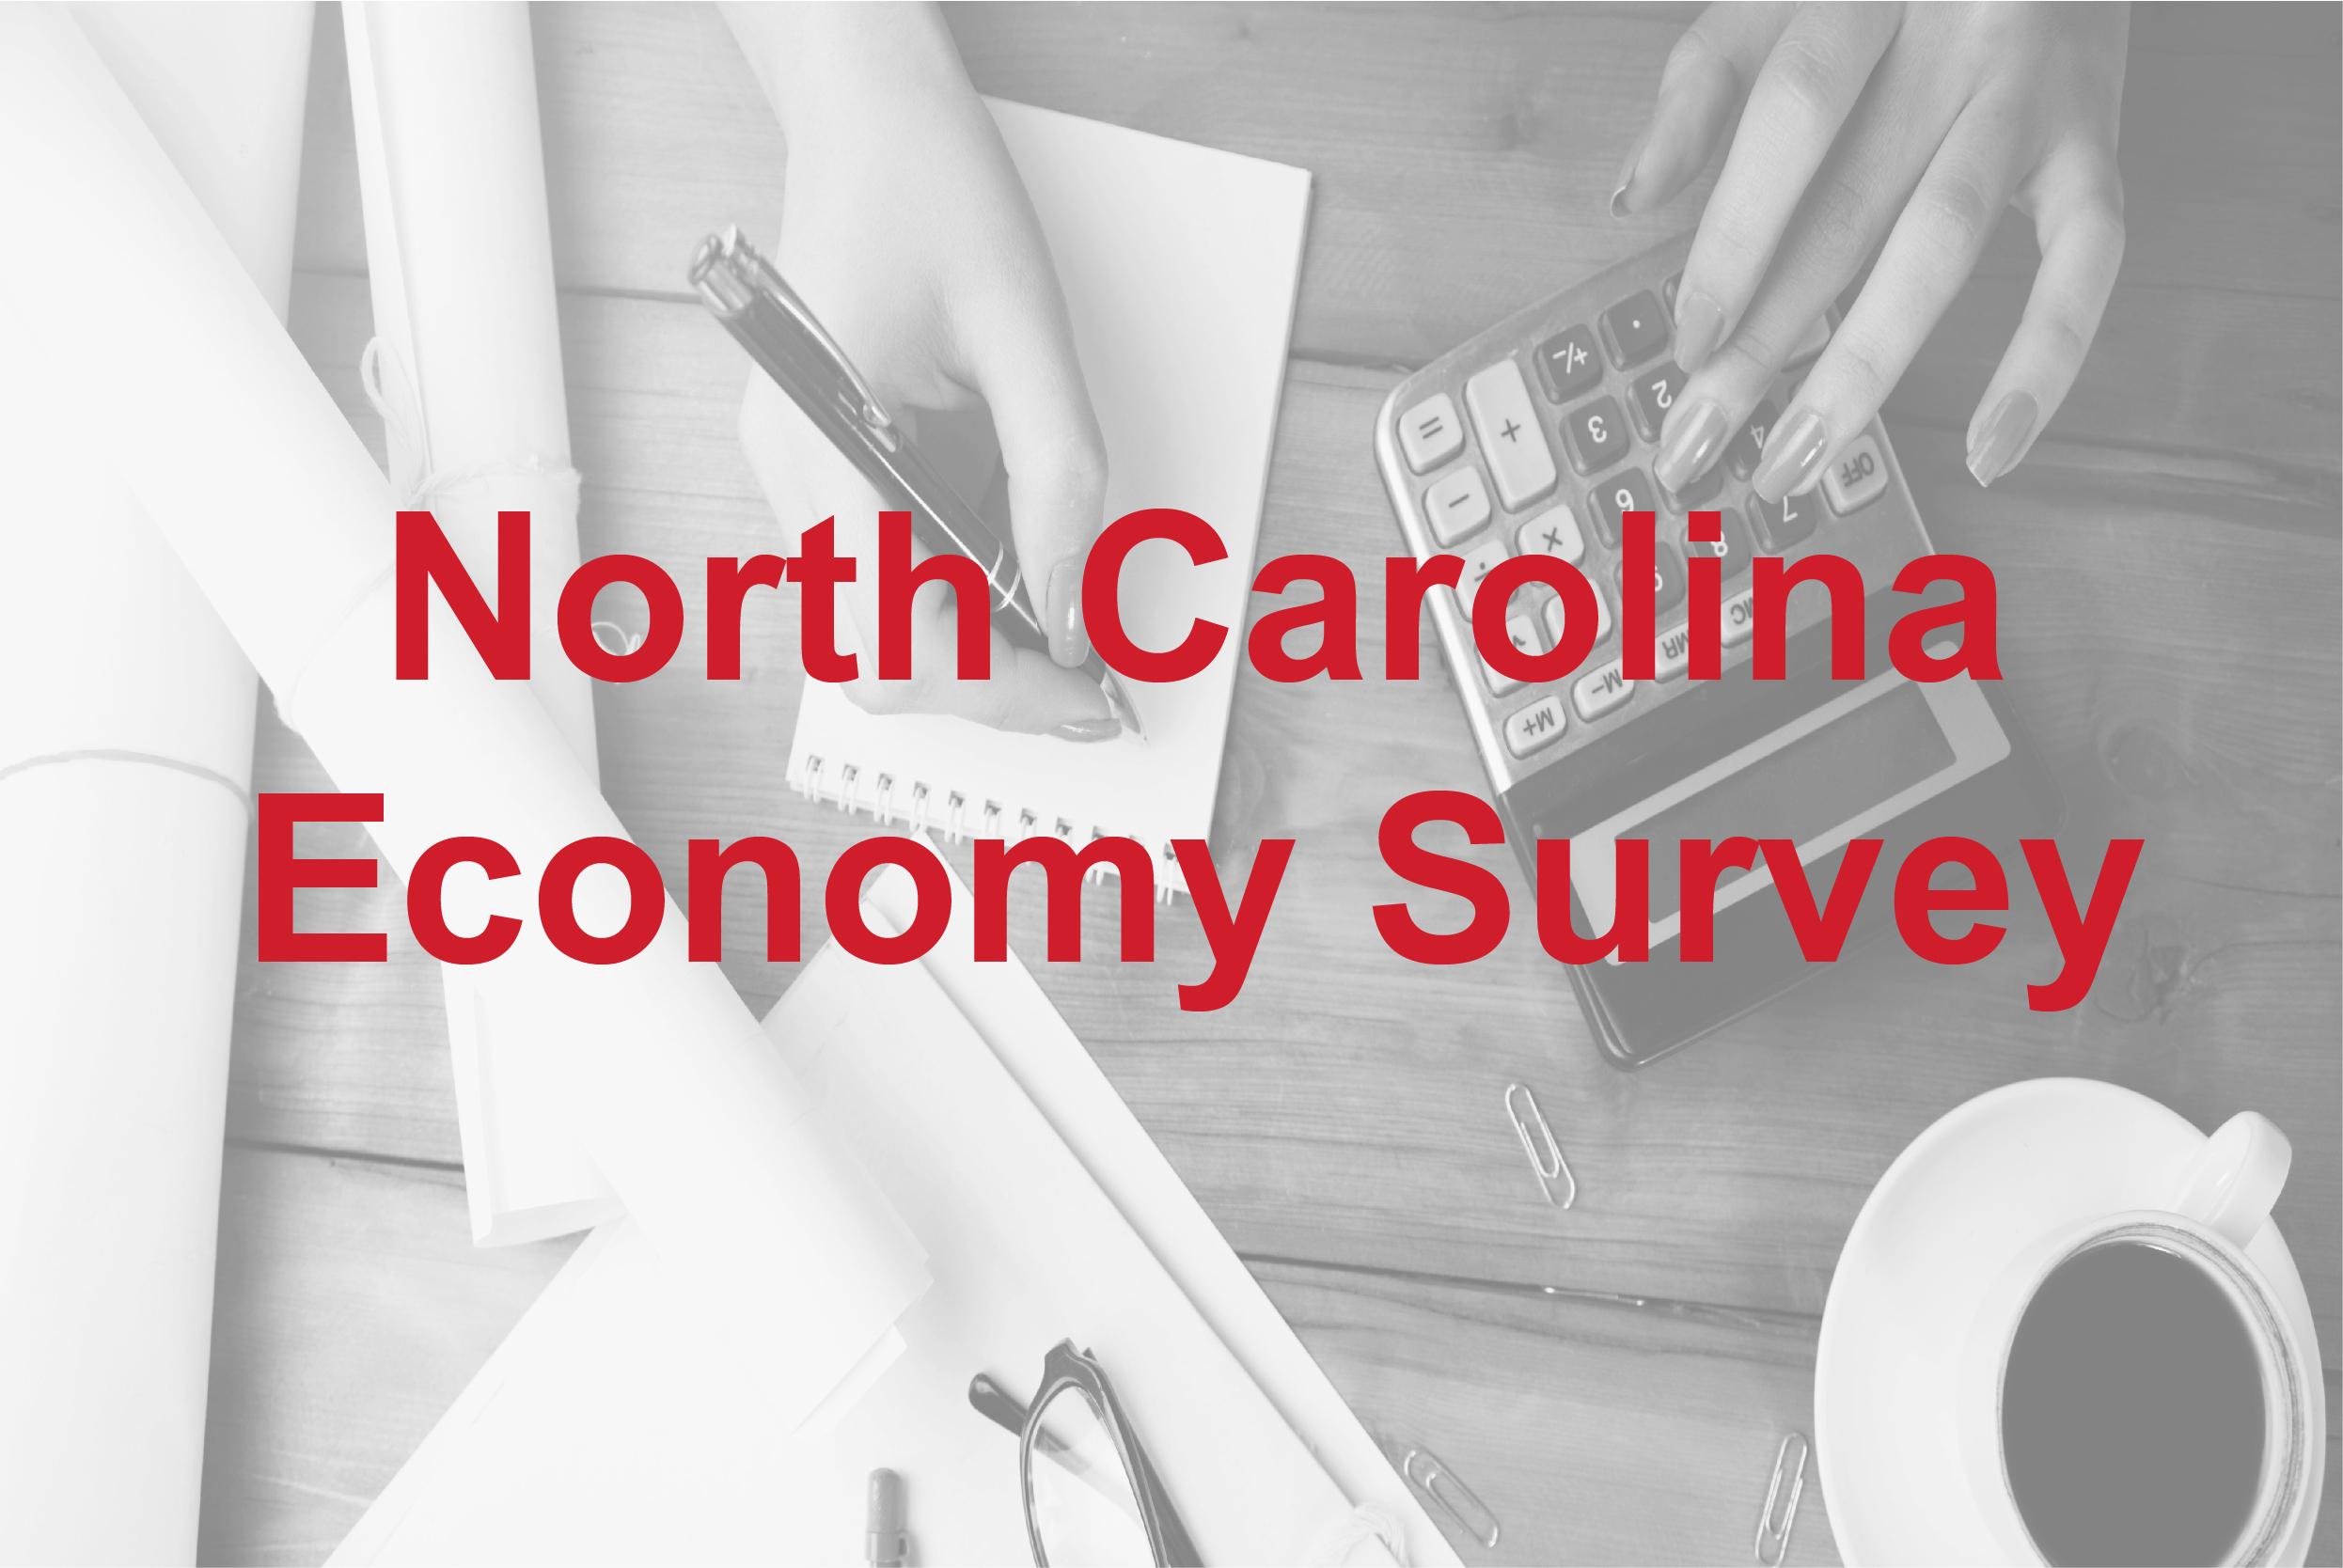 nc_econ_survey.jpg